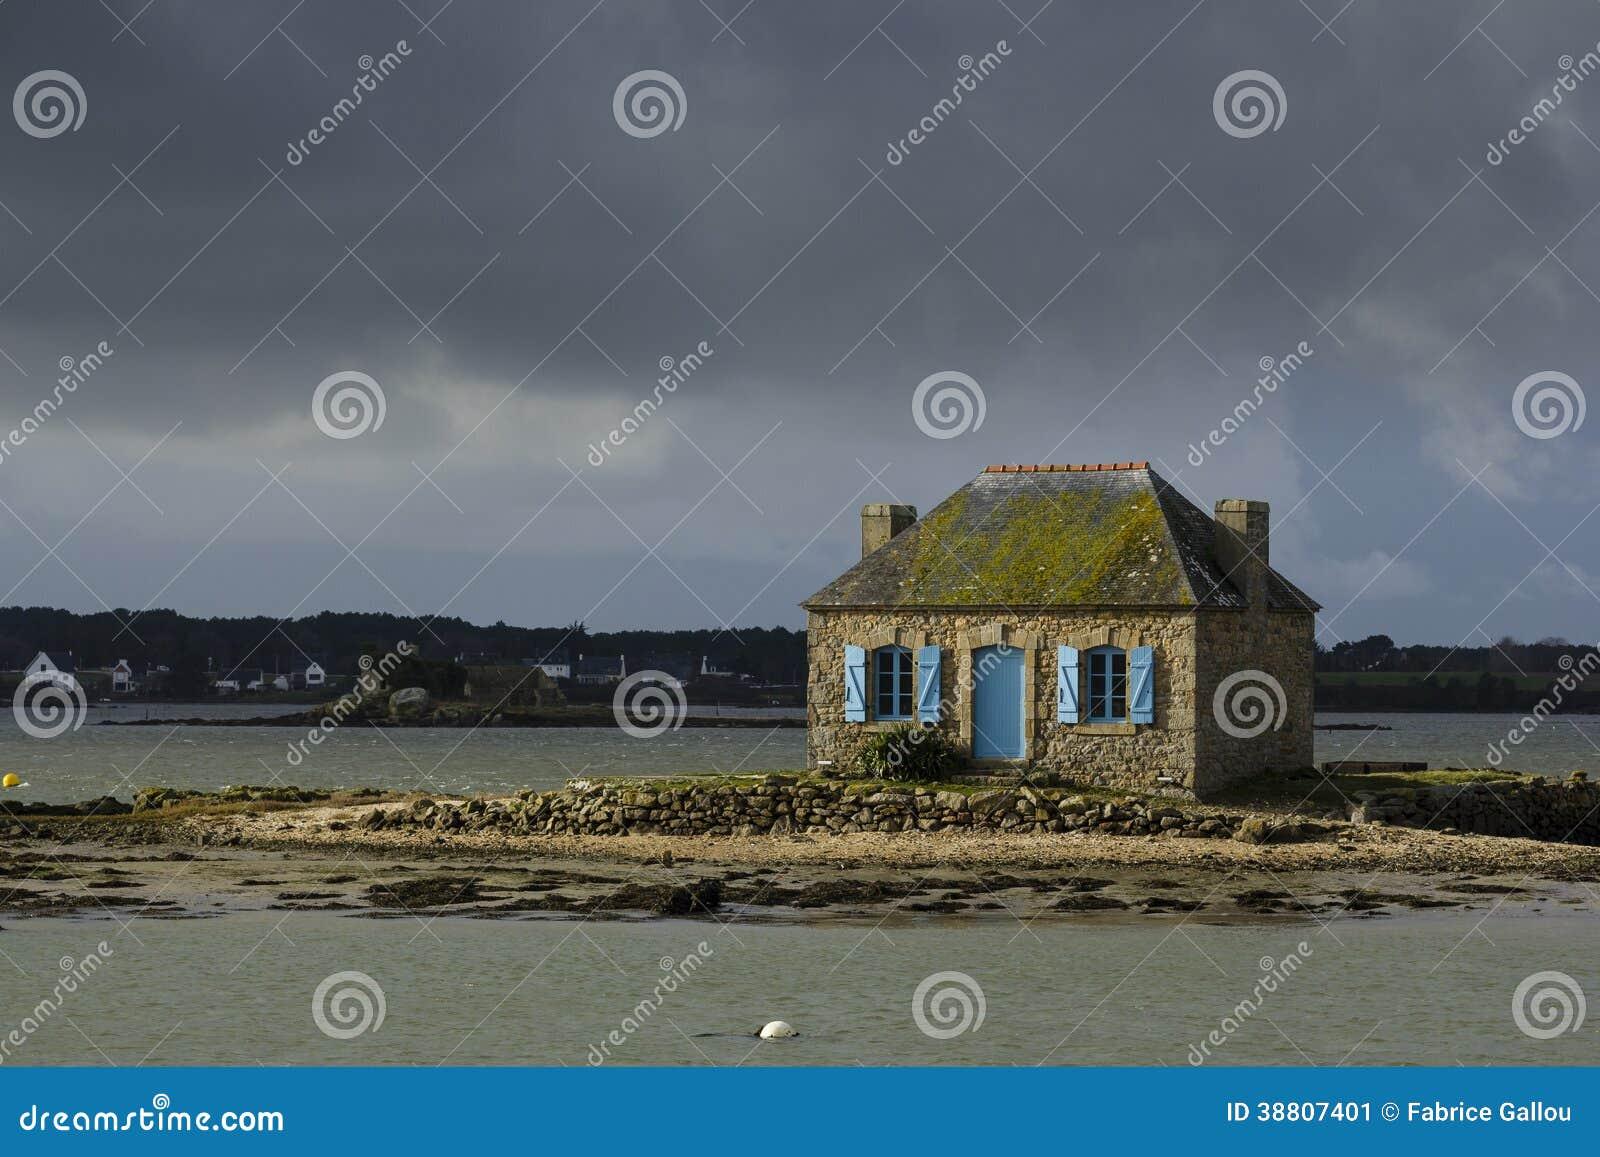 Little house on the island